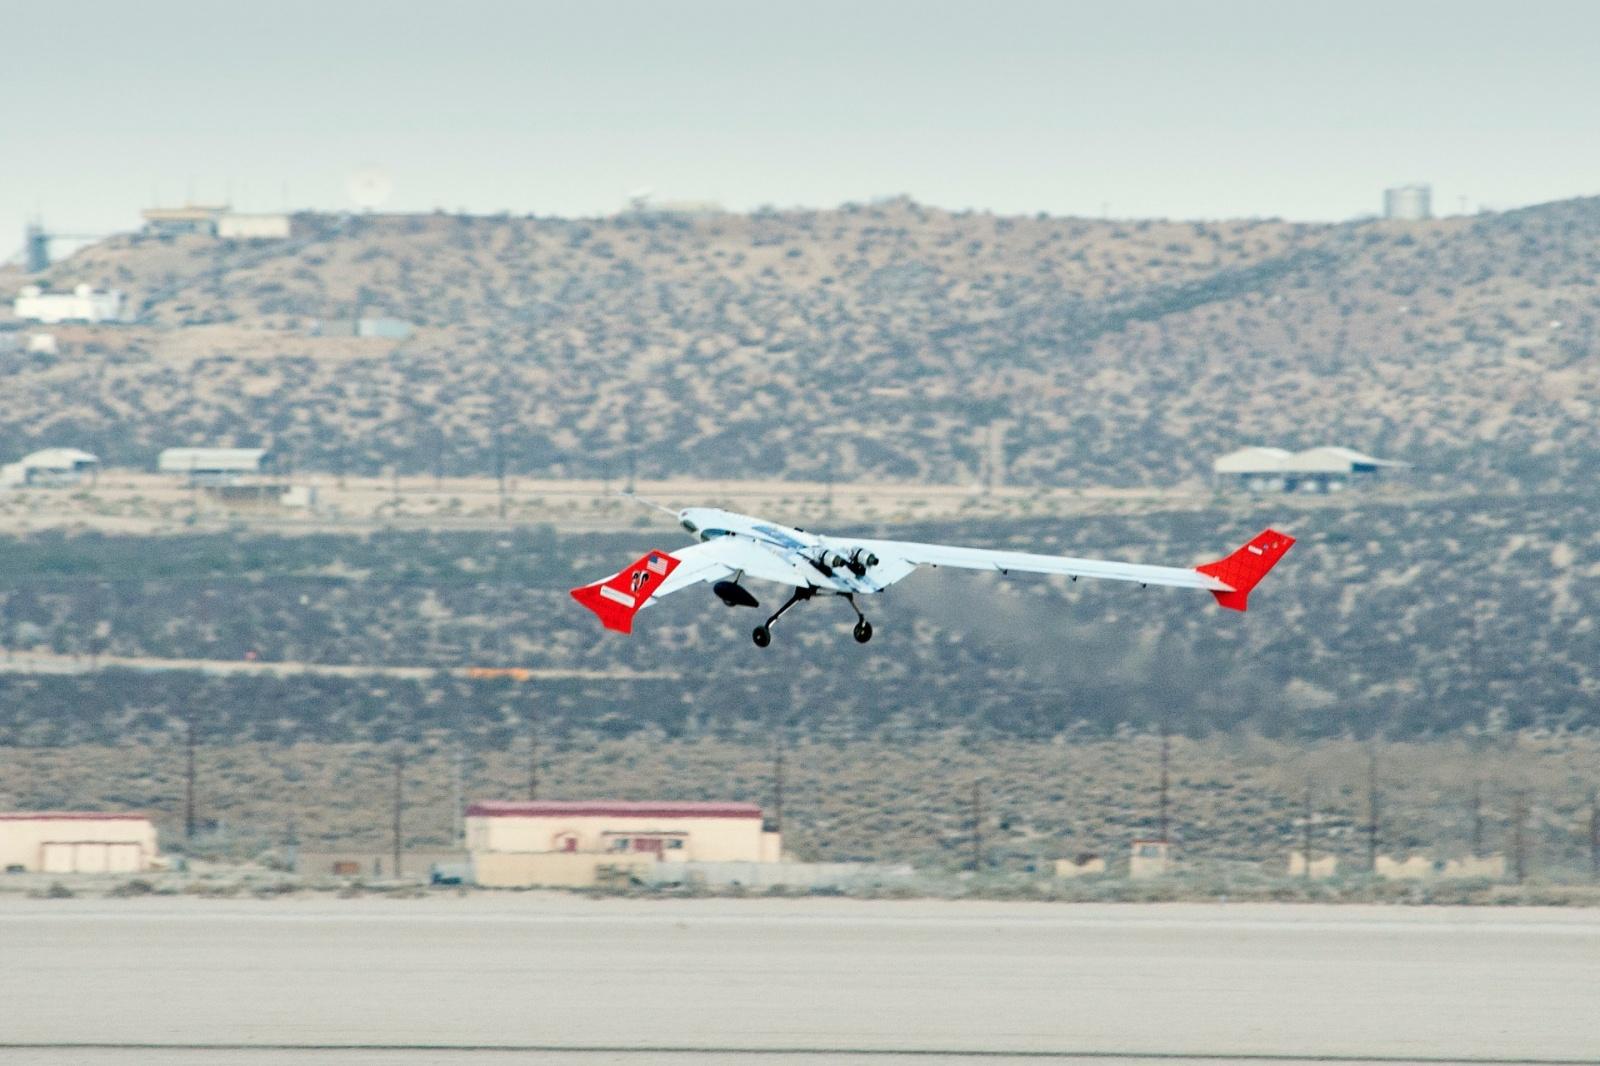 НАСА анонсировало электрический самолёт X-57 Maxwell - 6